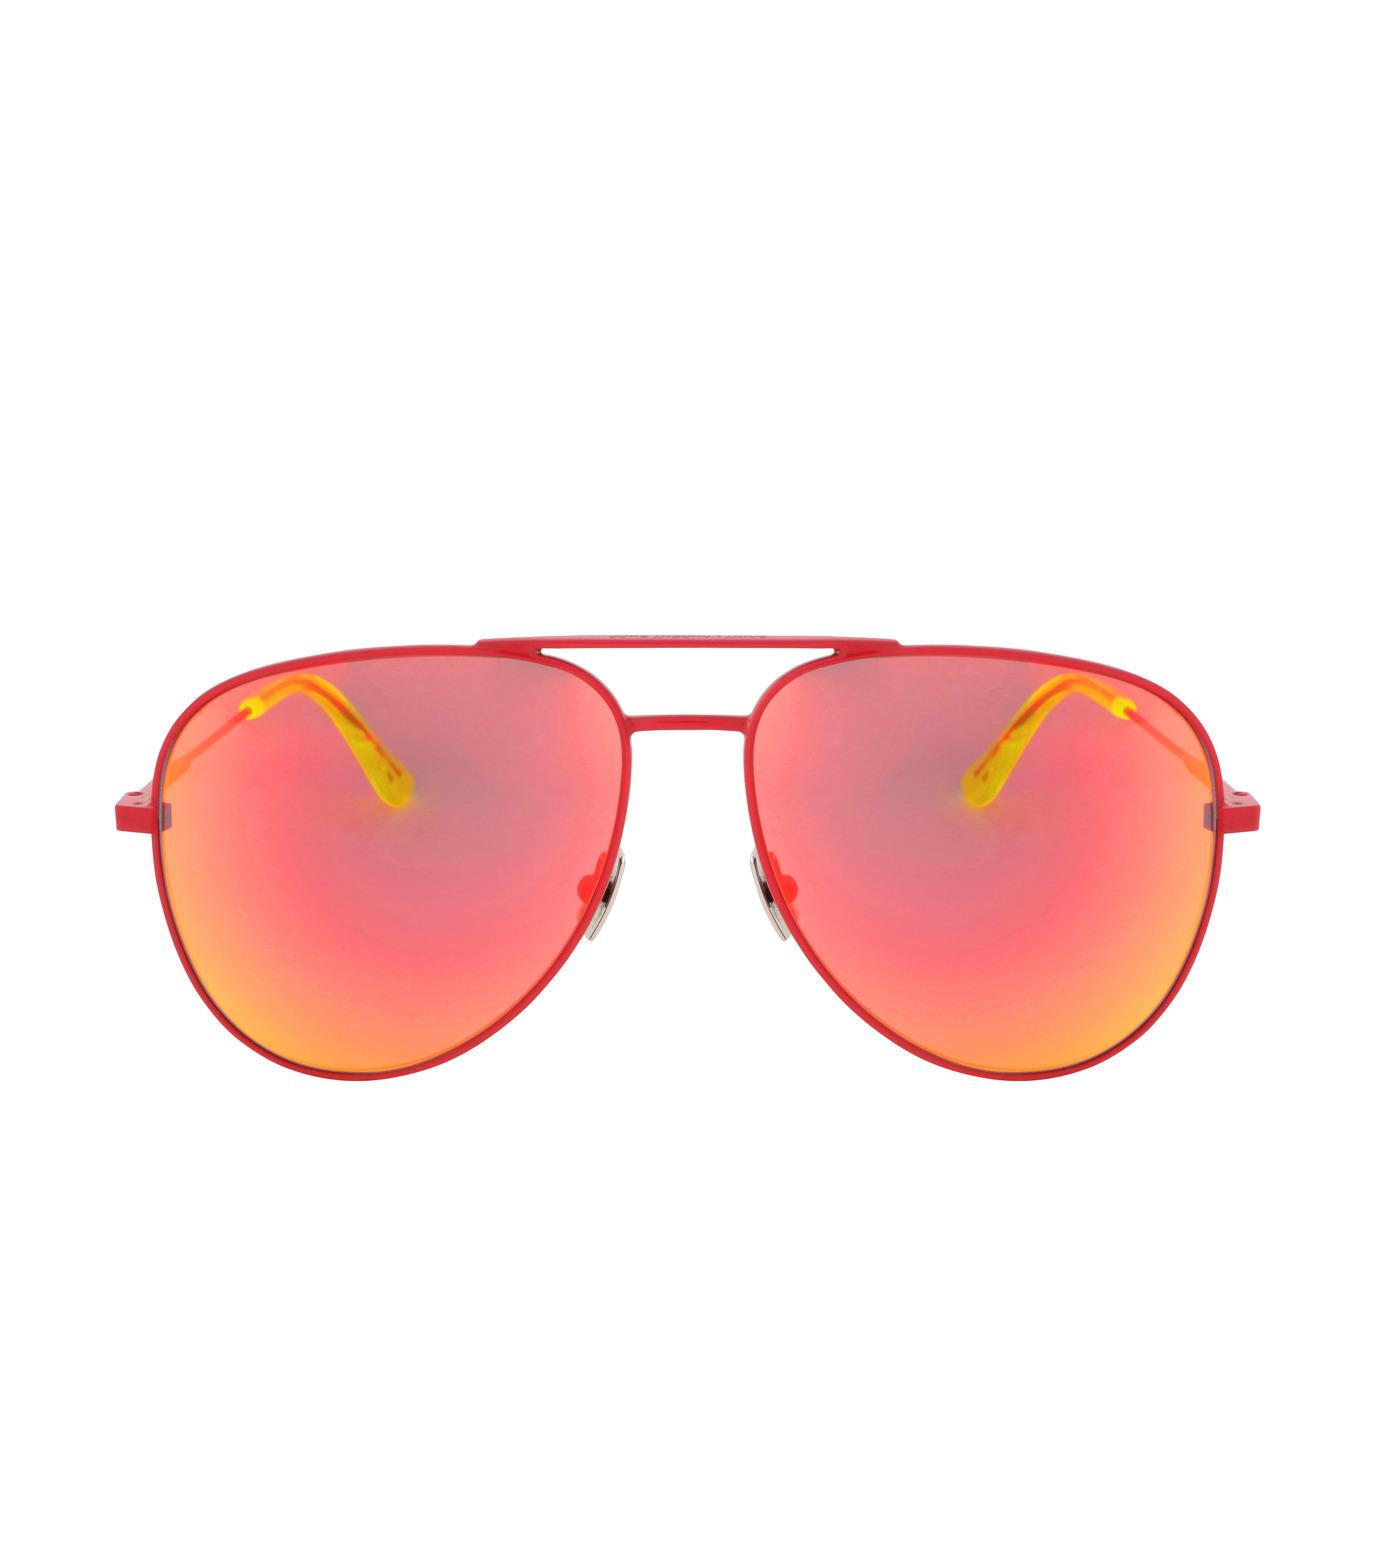 SAINT LAURENT(サンローラン)のTeardrop-PINK(アイウェア/eyewear)-427758-Y9902-72 拡大詳細画像3